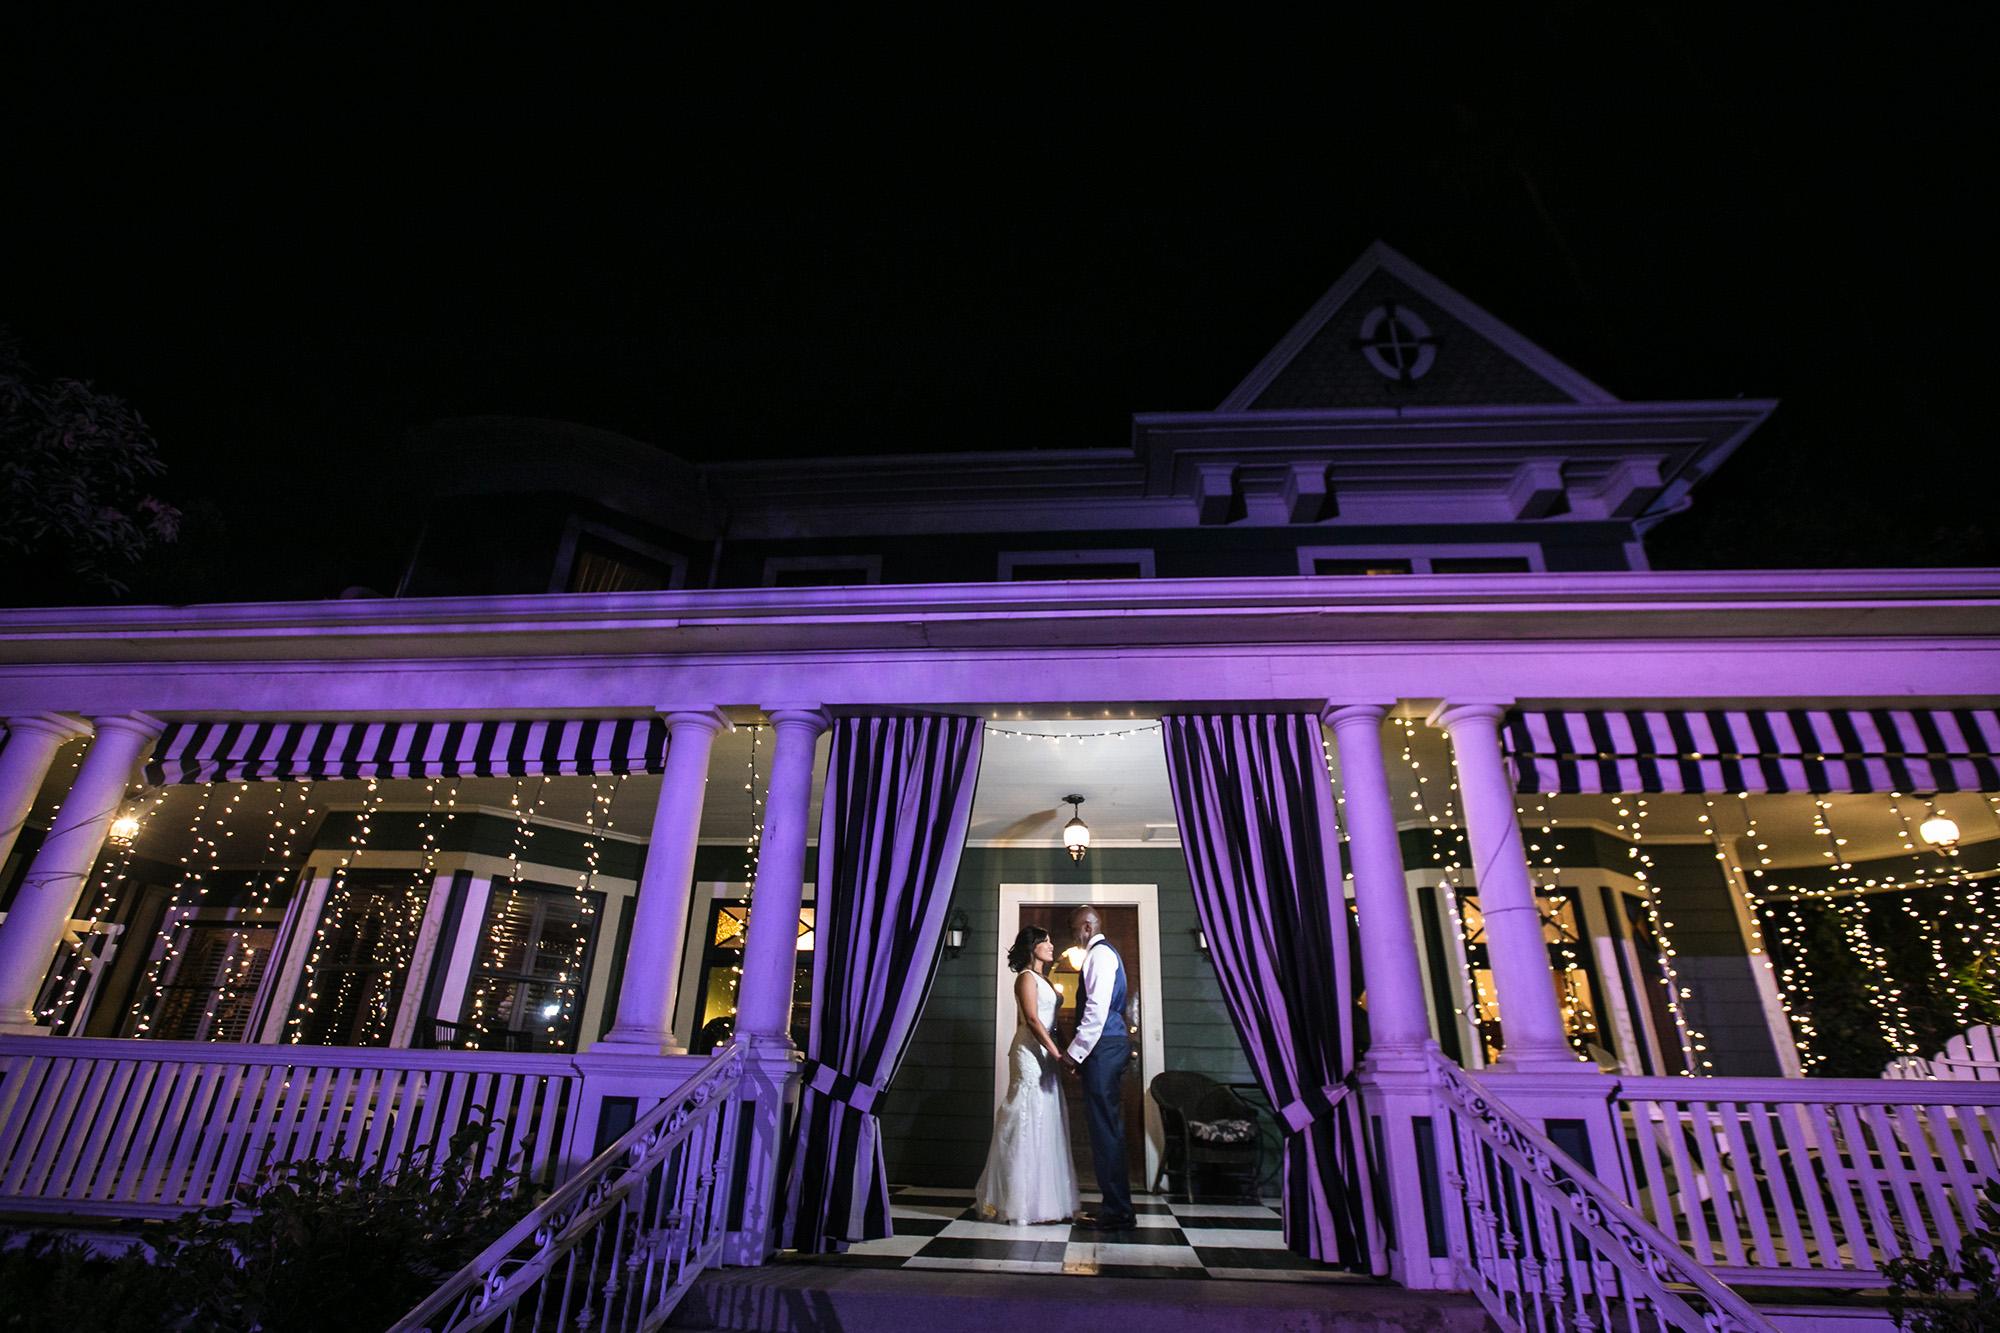 christmas-house-weddings-receptions-carrie-vines-182.jpg